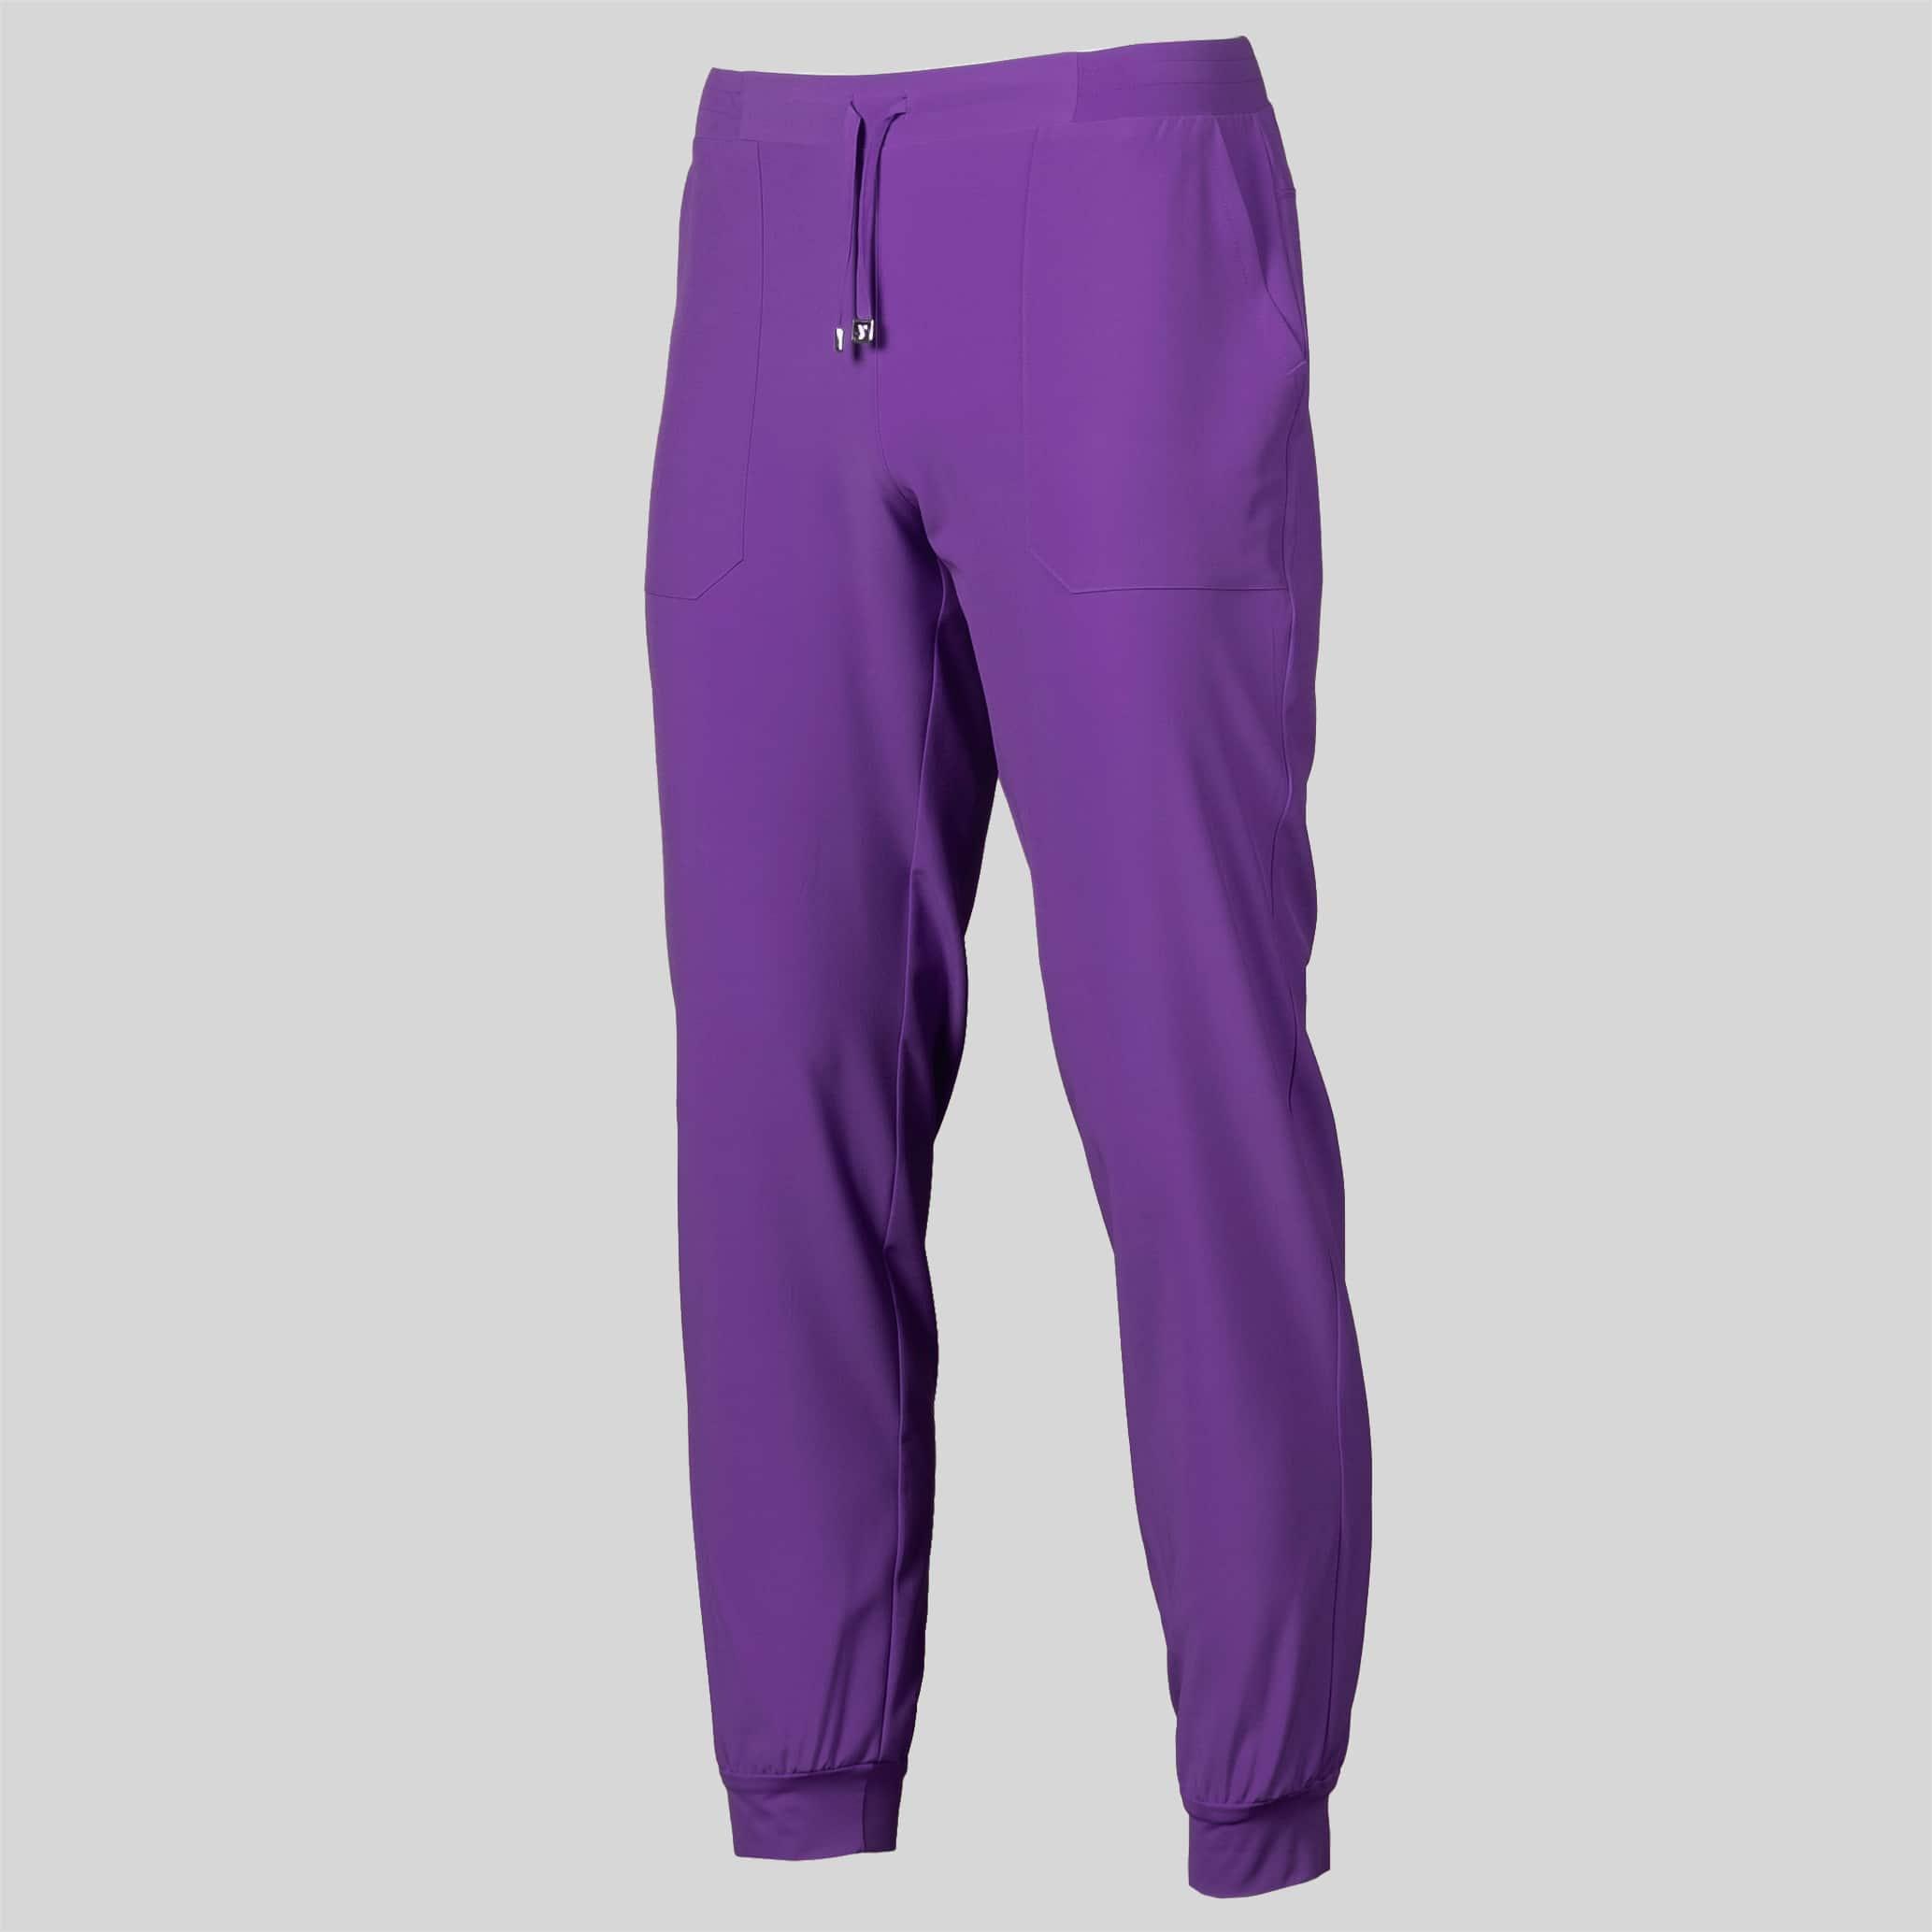 Gary´s 704700 Pantalon Unisex Jogger Morado